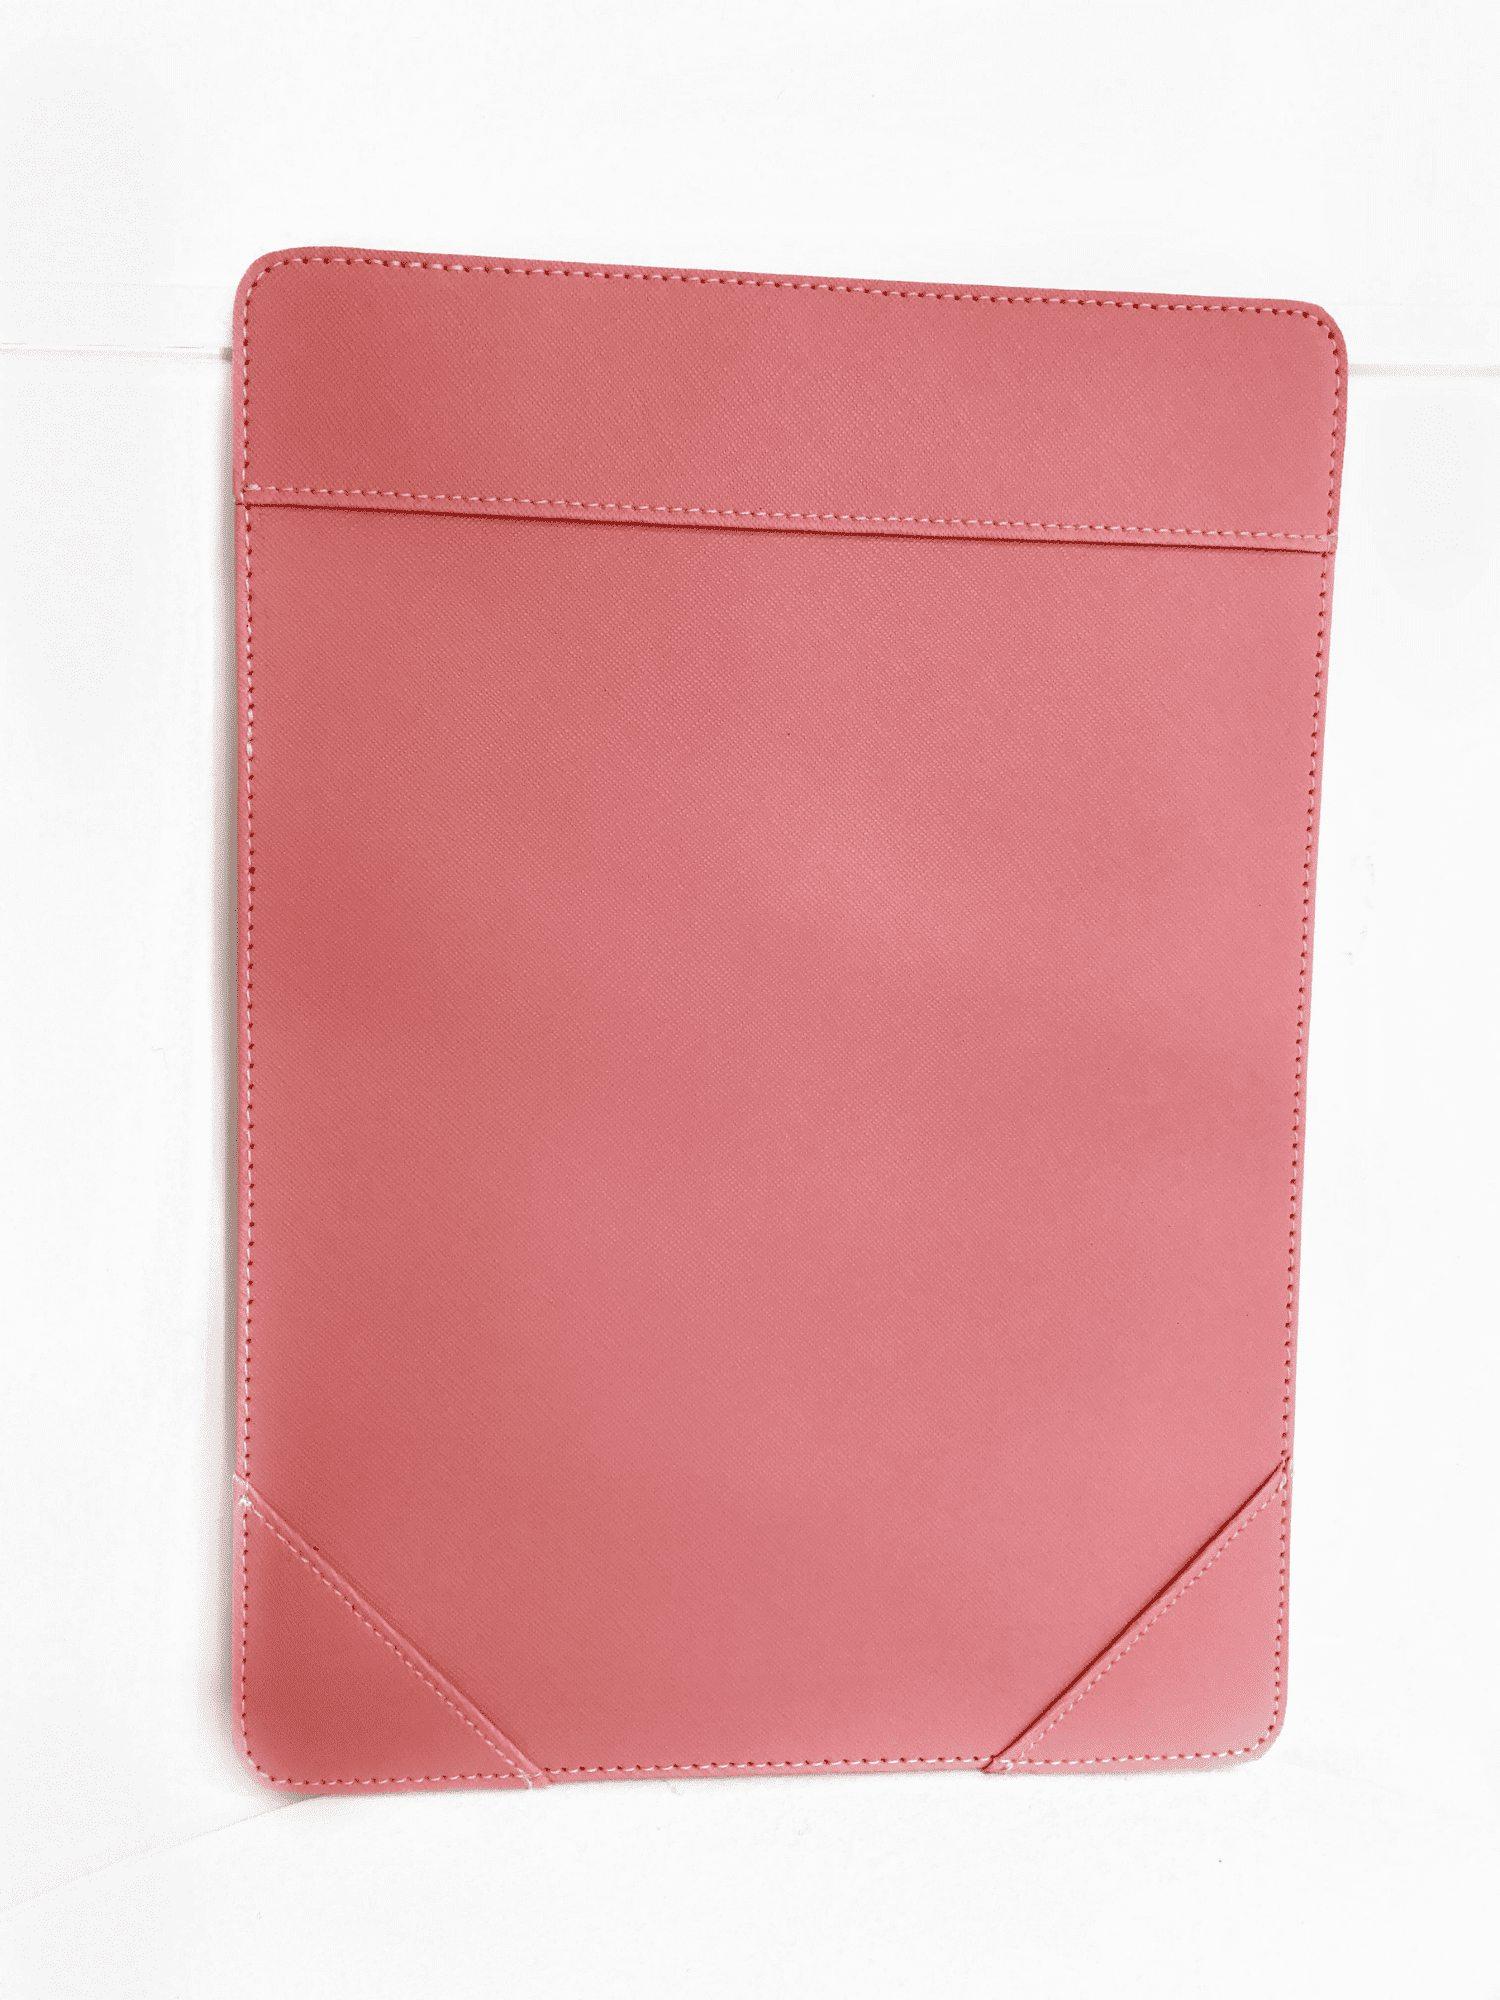 Risque Rabisque - rosa chiclete